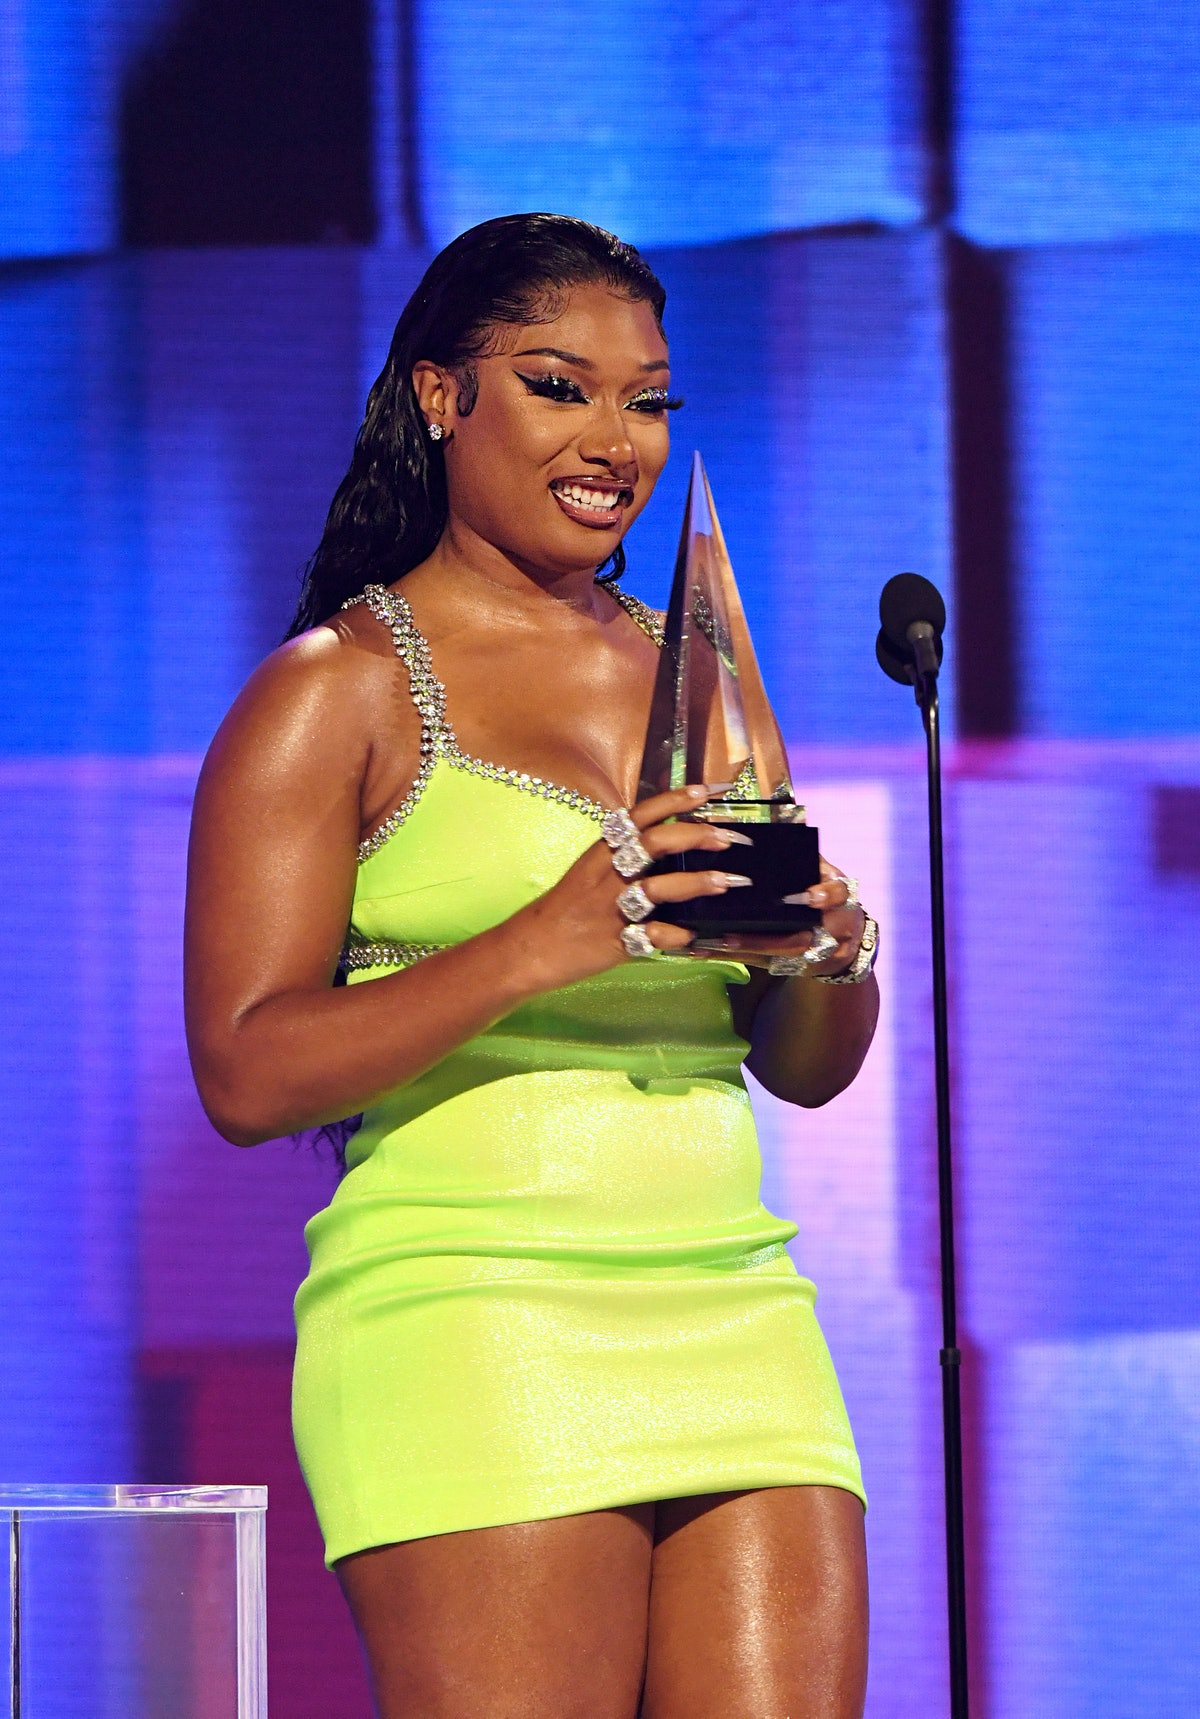 Megan in a bright green dress accepting an award